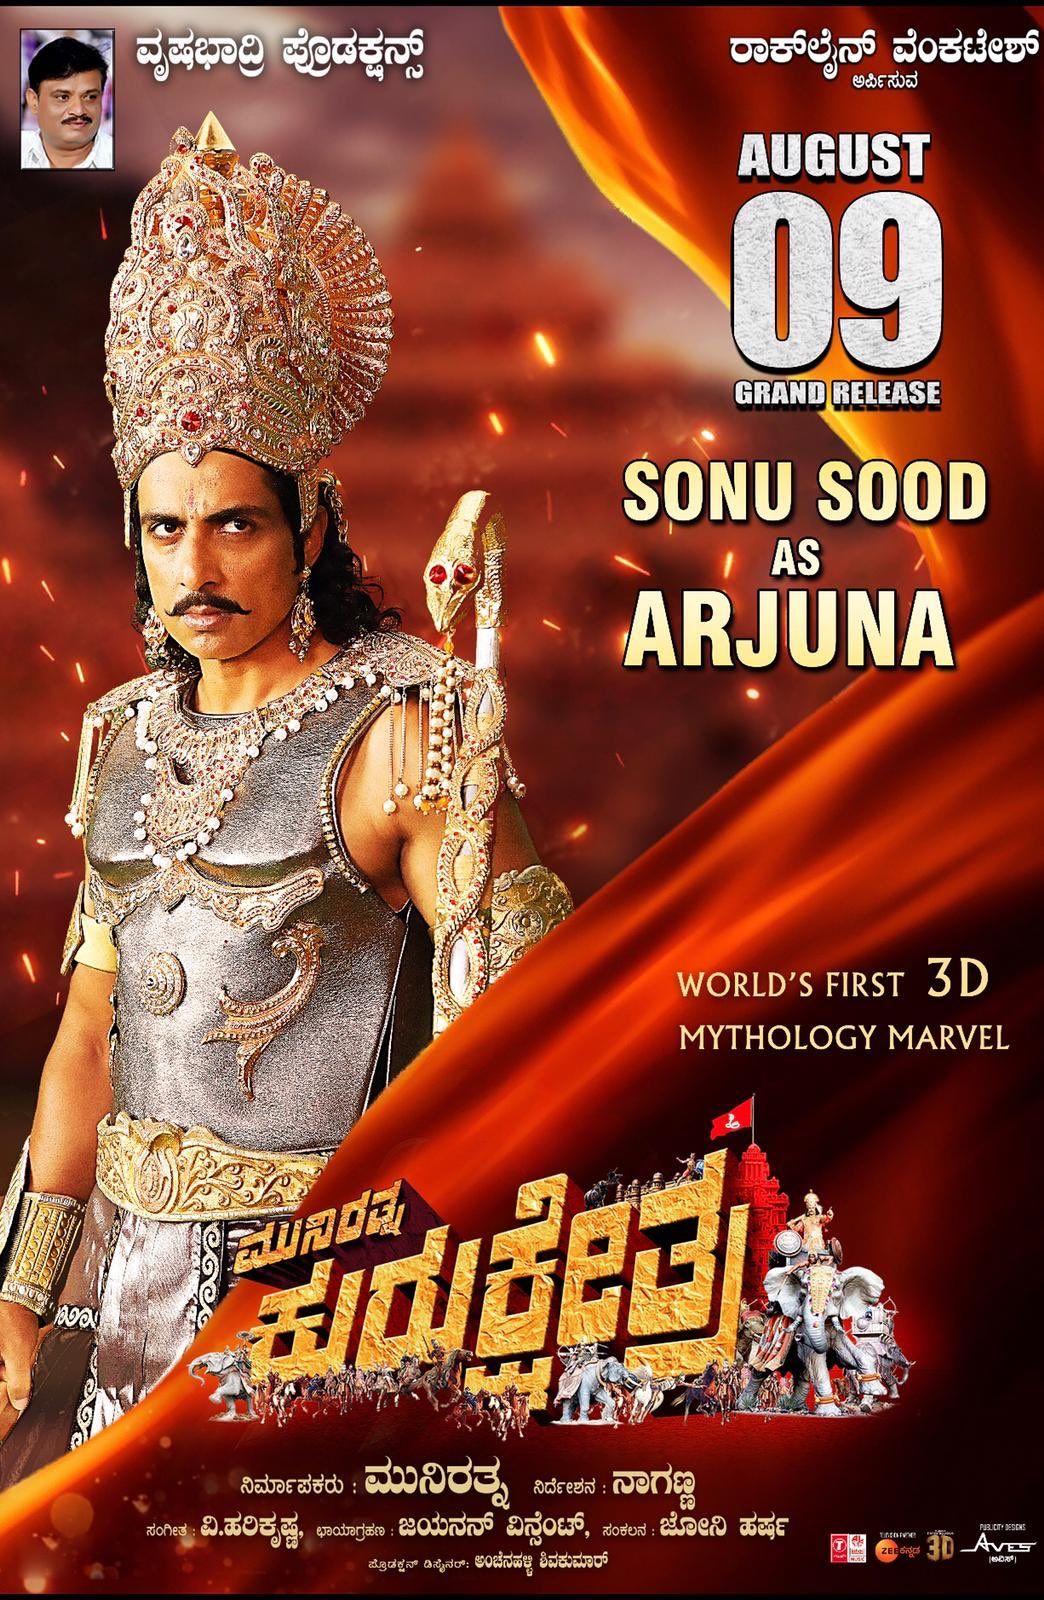 Kurukshetra Review Darshan Thoogudeep Starrer Much Awaited And It Is Multi Language Movie Which Will Hit The Theatres Tomorrow See Latest Kannada Movies Sonu Sood Kurukshetra